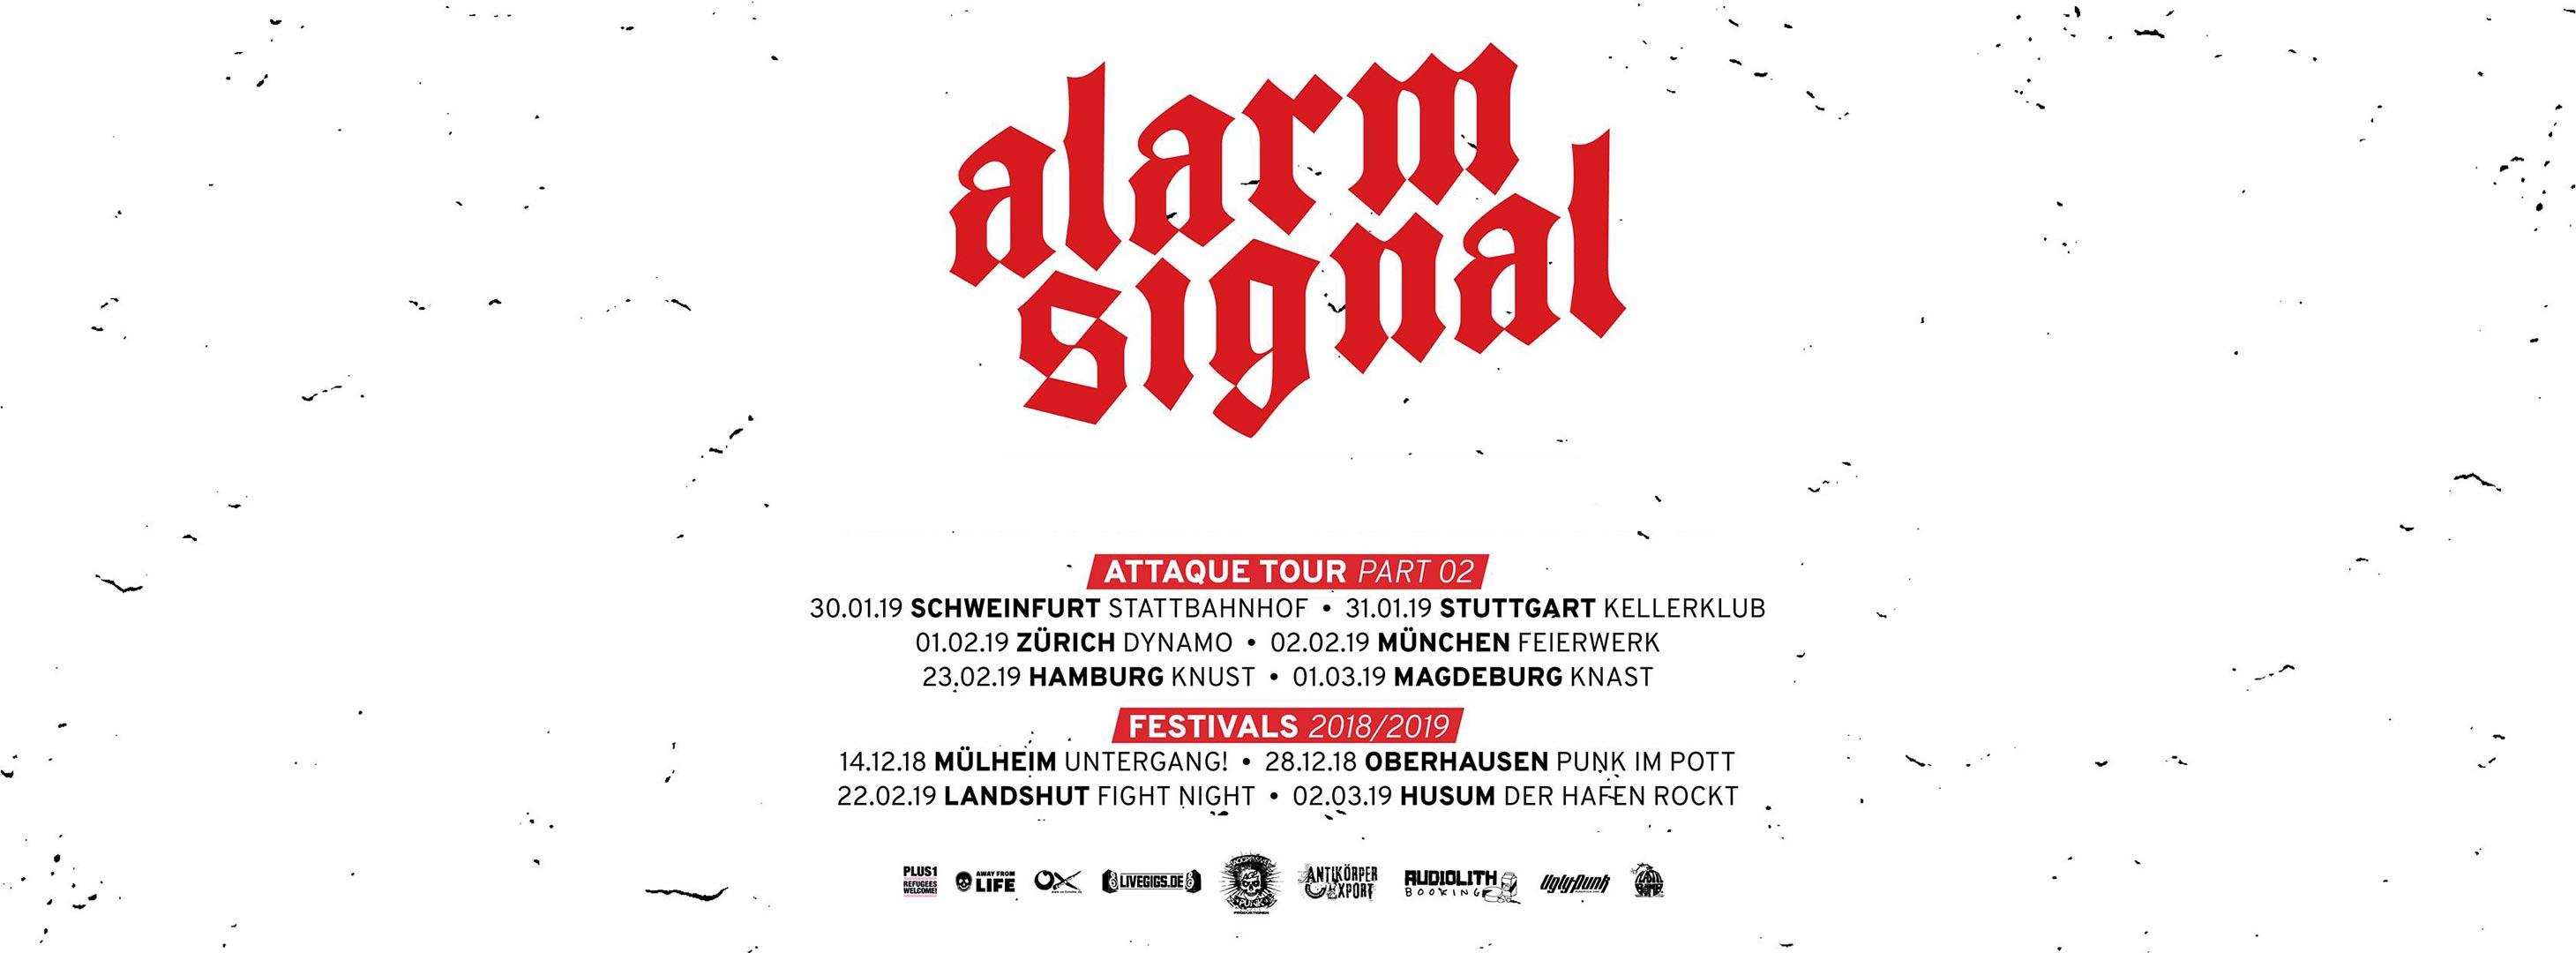 Alarmsignal Attaque-Tour 2018 - Konzerte